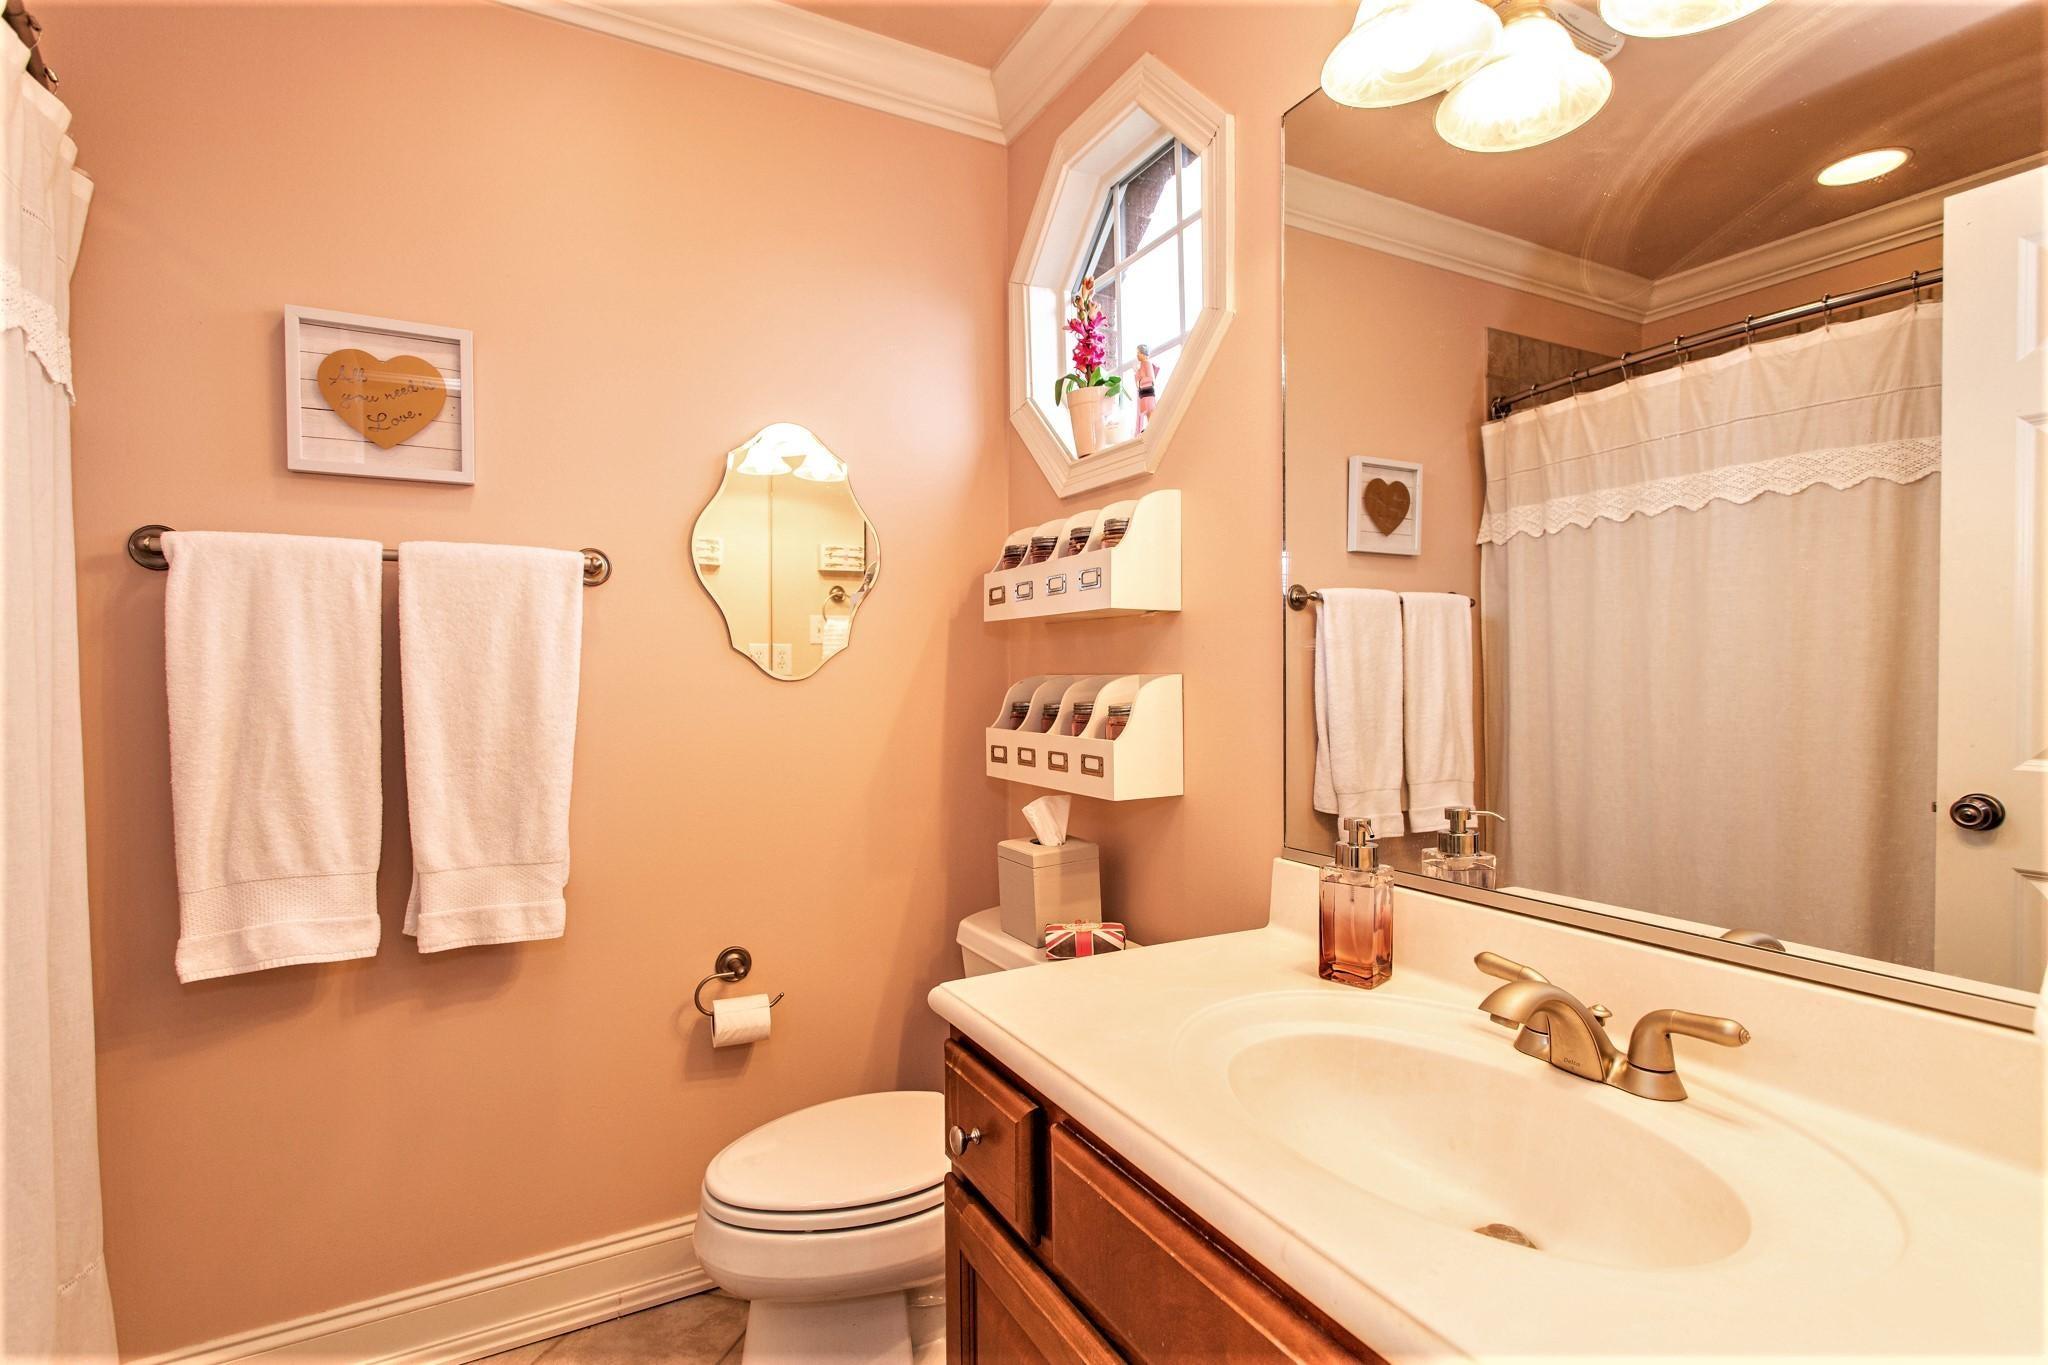 BATHROOM WITH ADJOINING BEDROOM